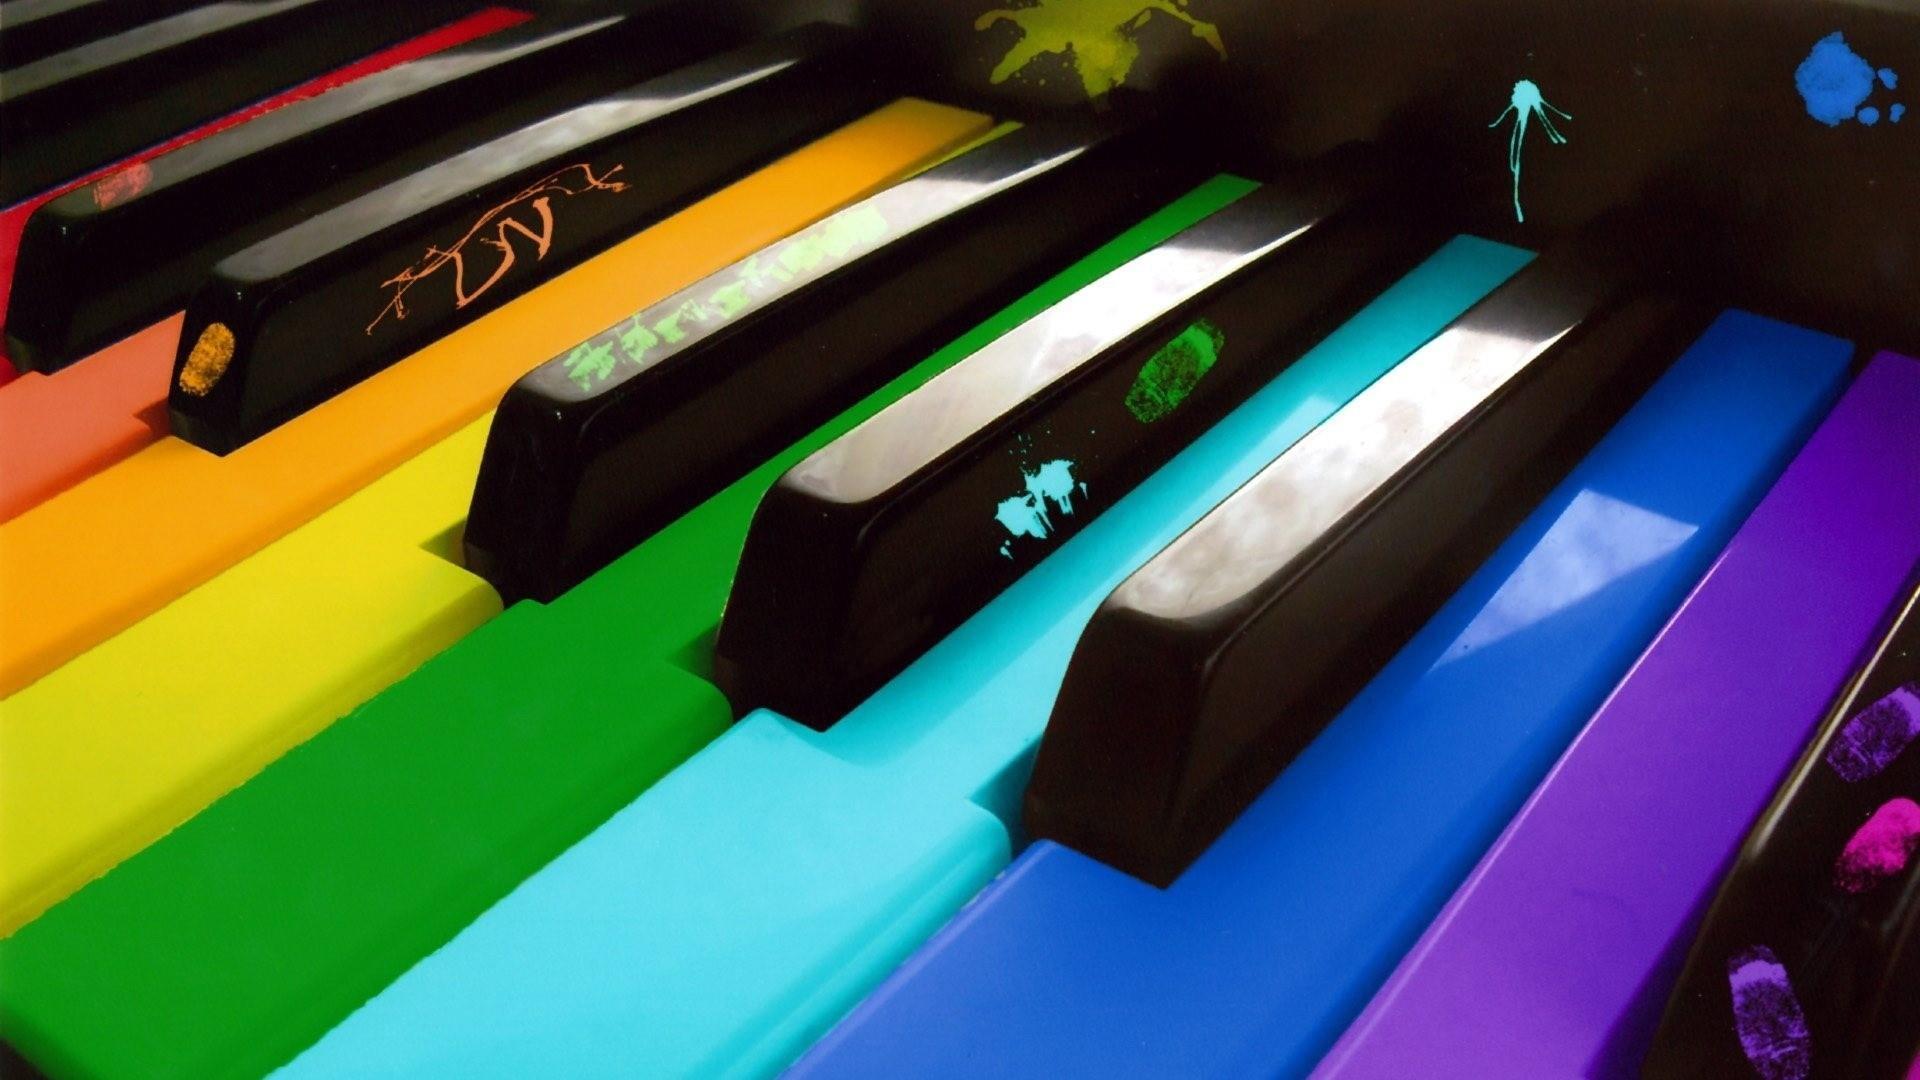 Colorful piano keyboard wallpaper